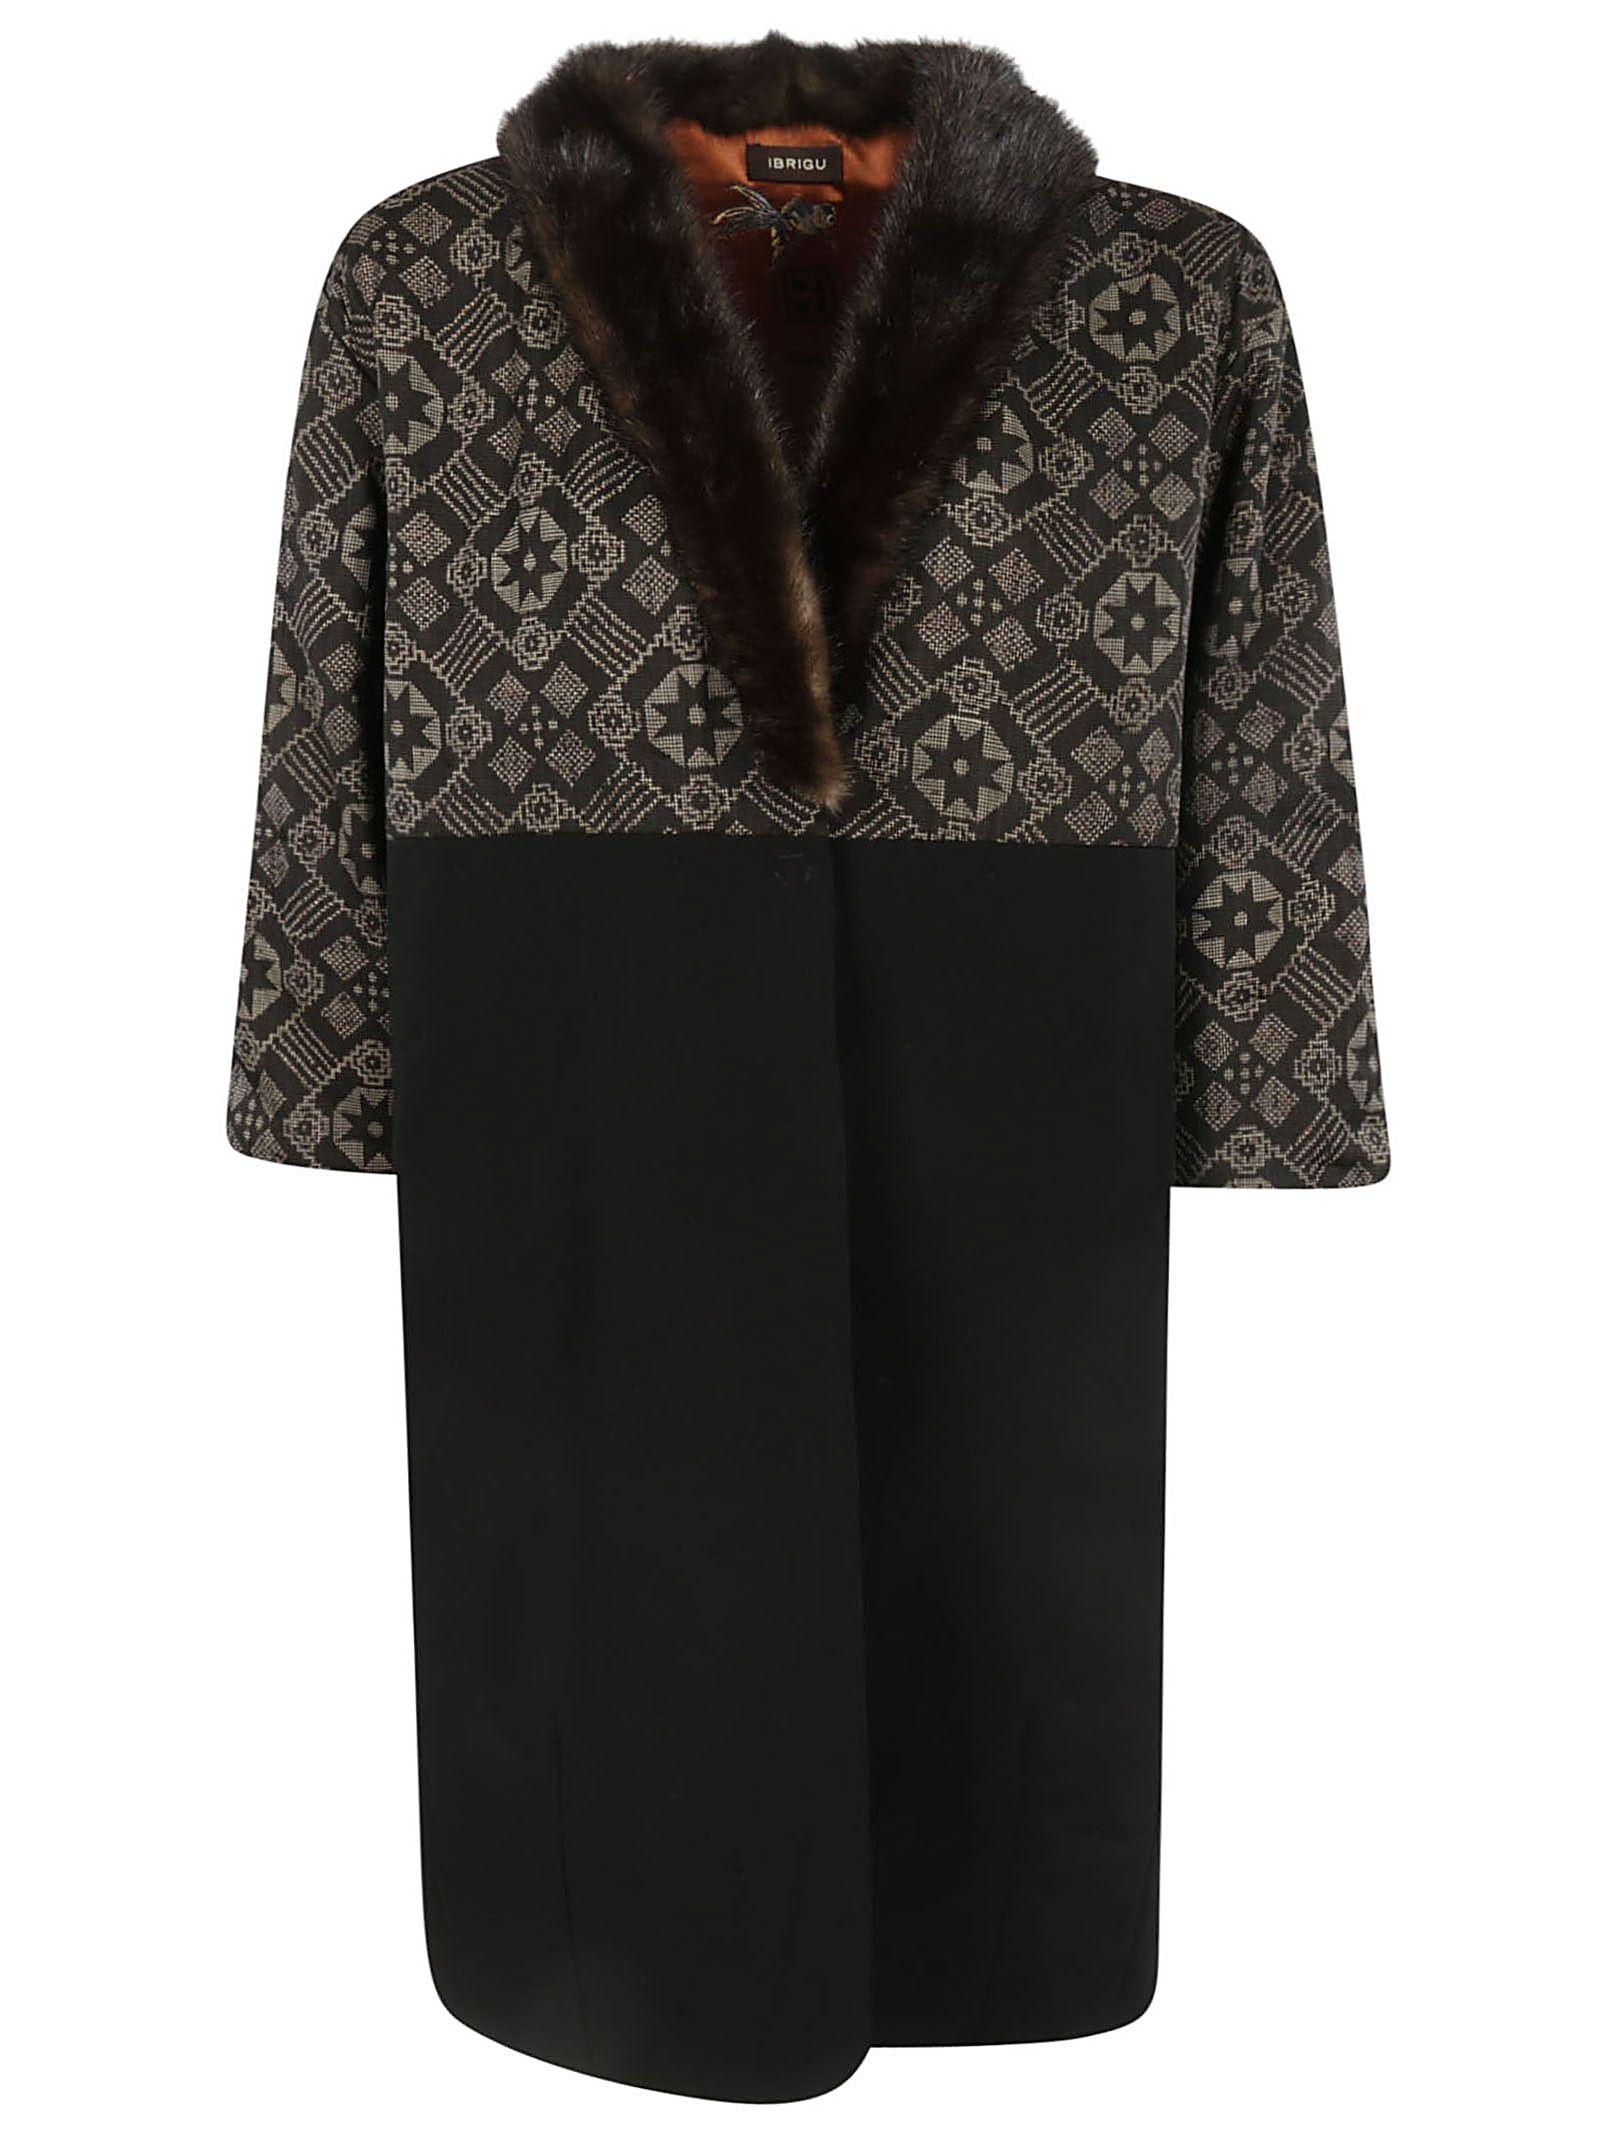 IBRIGU Fur Coat in Fantasy1